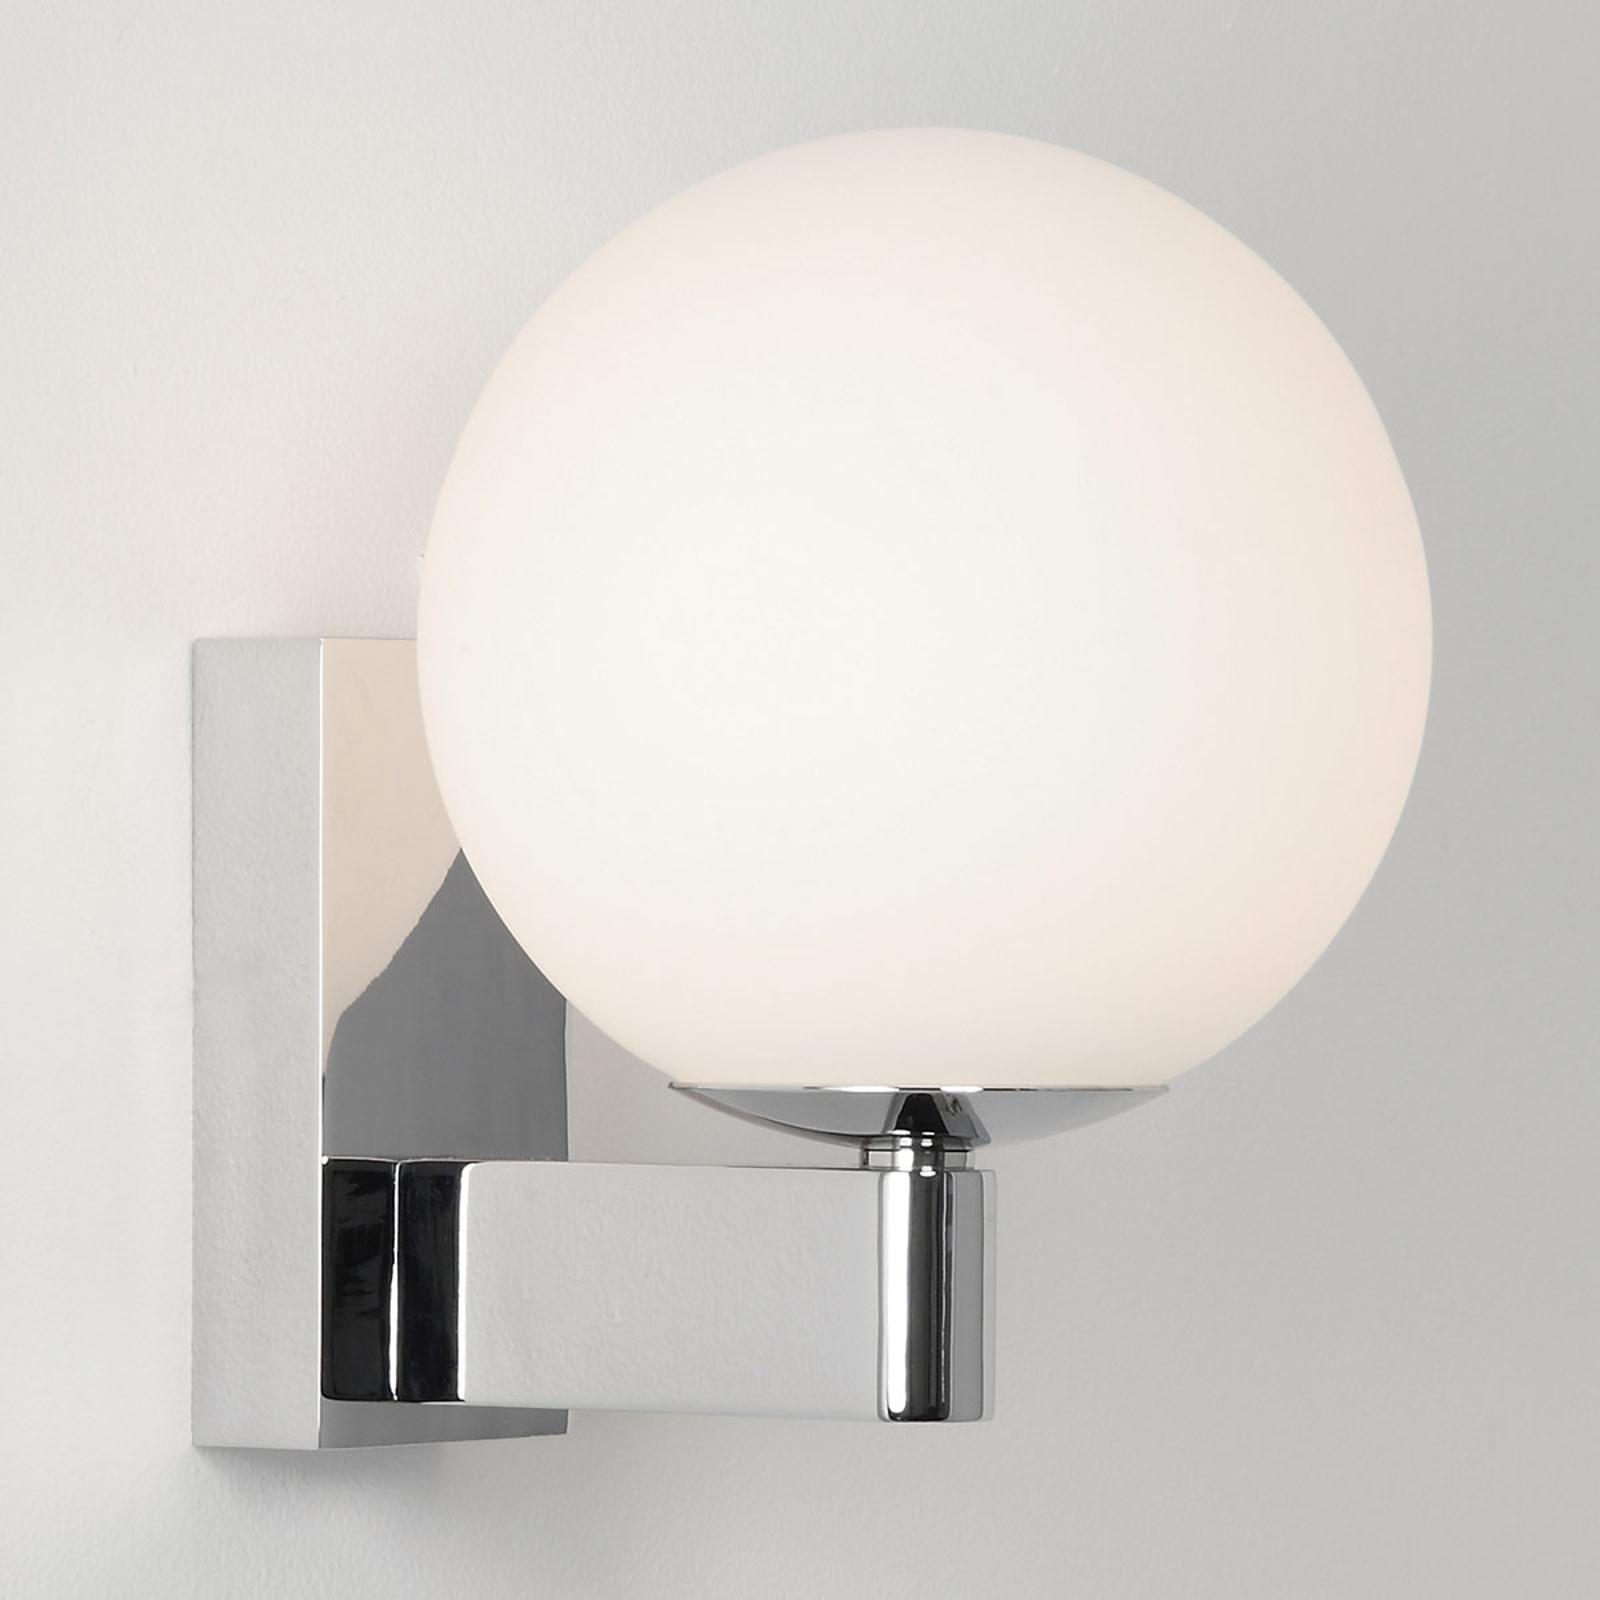 Elegant, kugleformet SAGARA væglampe